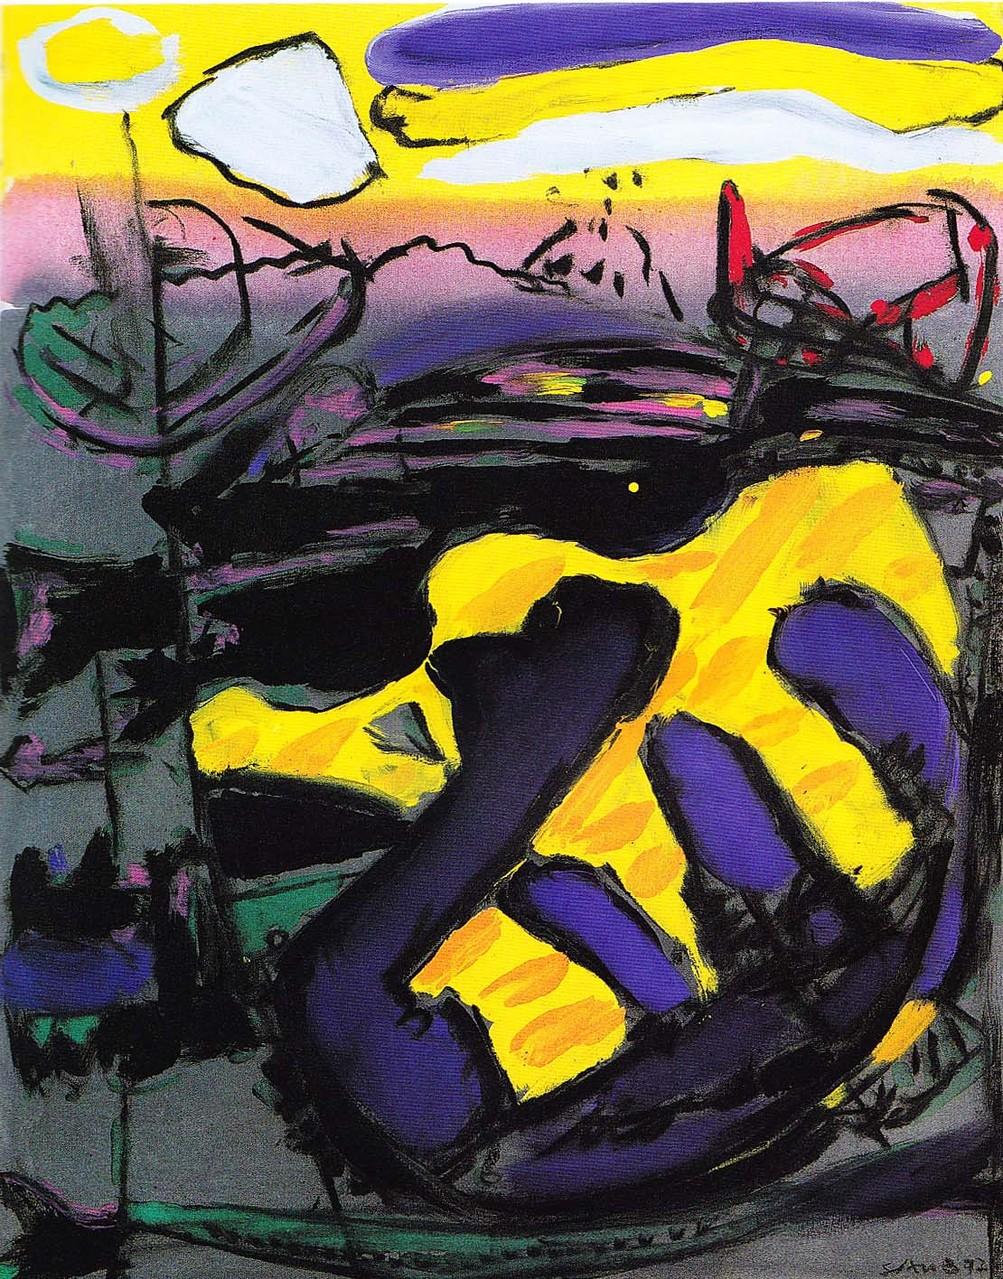 """Reflexe"", Acryl auf Leinwand, 1992"